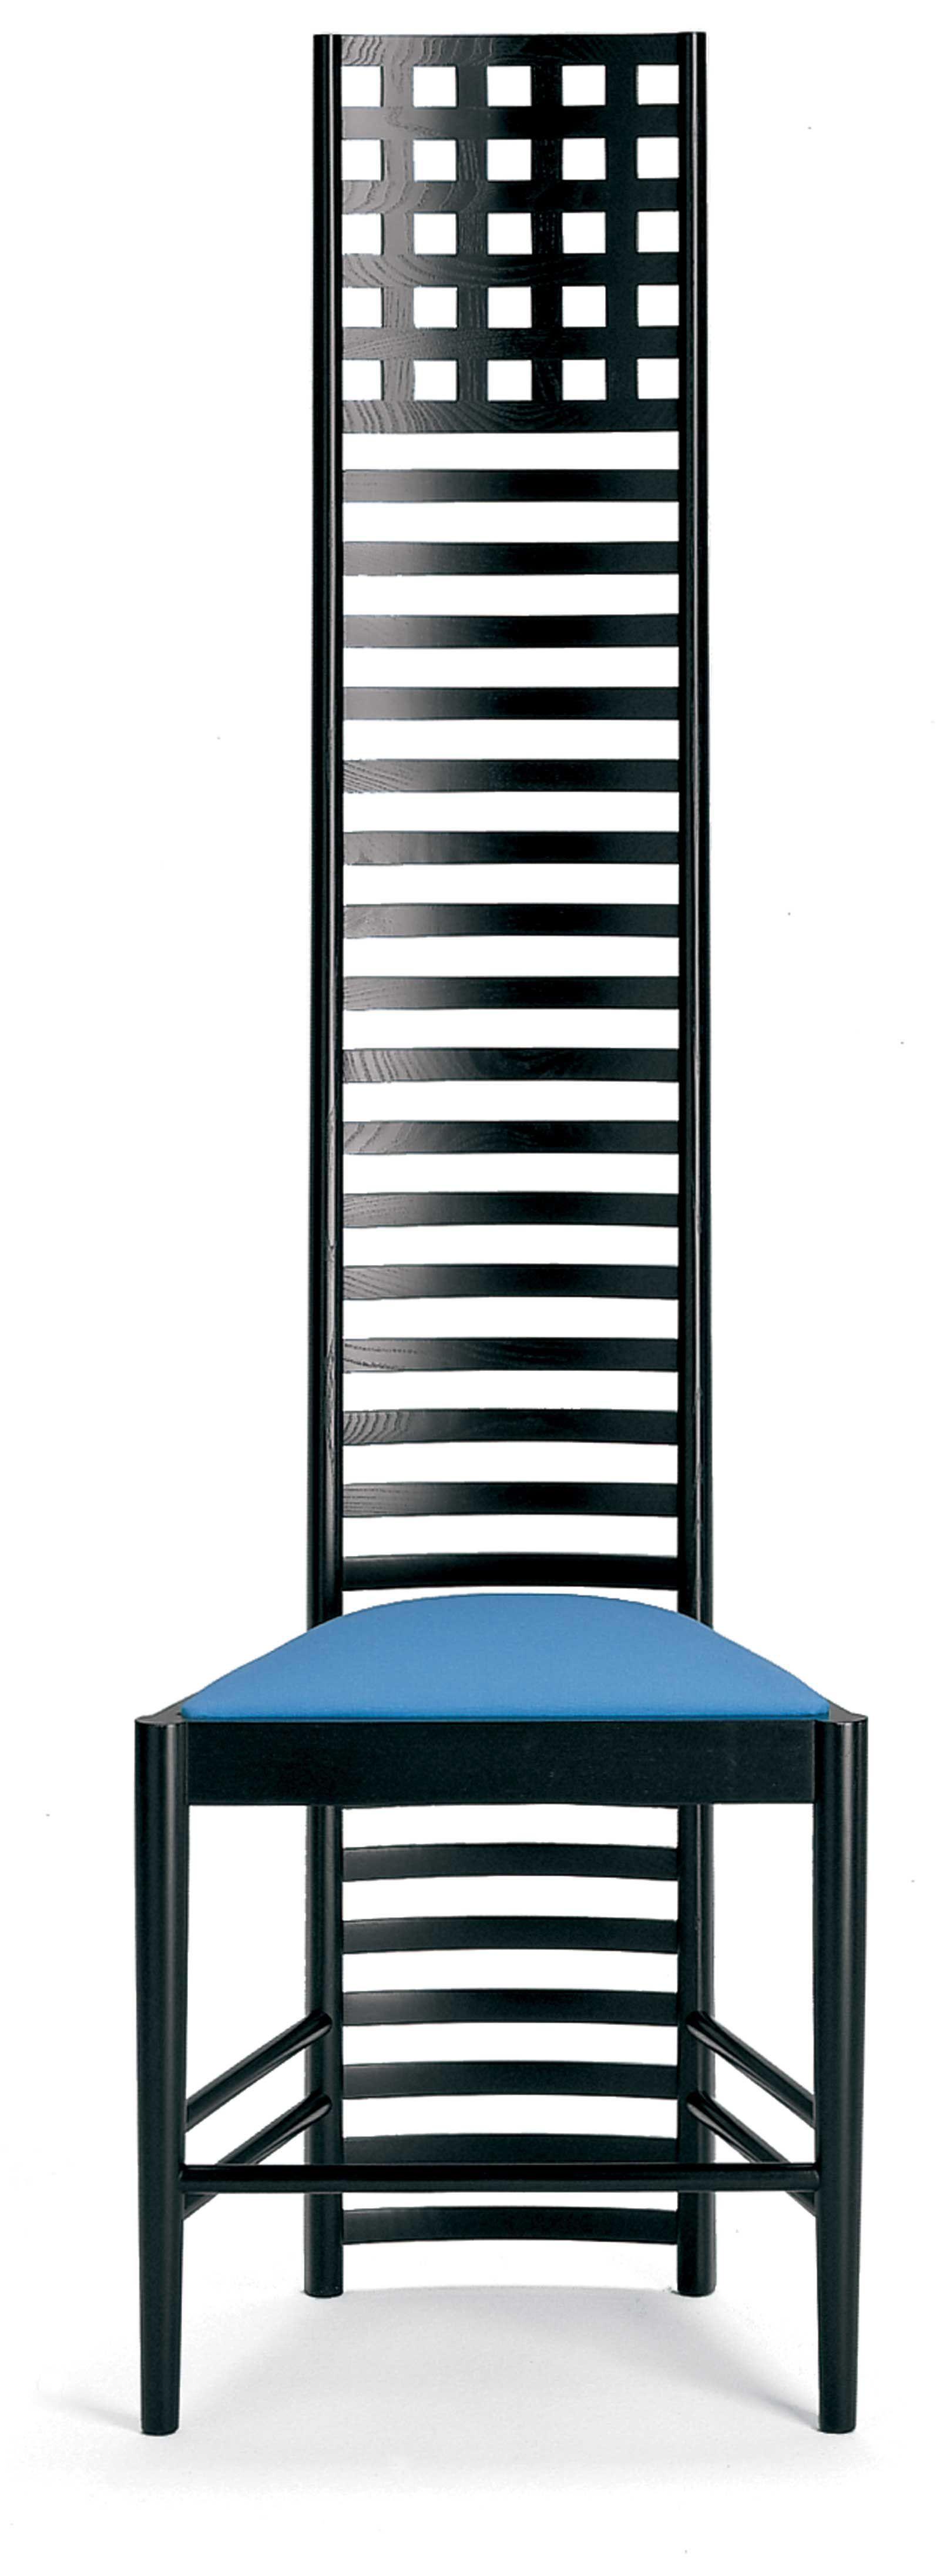 charles rennie mackintosh willow chair sofa bed tesco las 10 sillas de diseño moderno más famosas